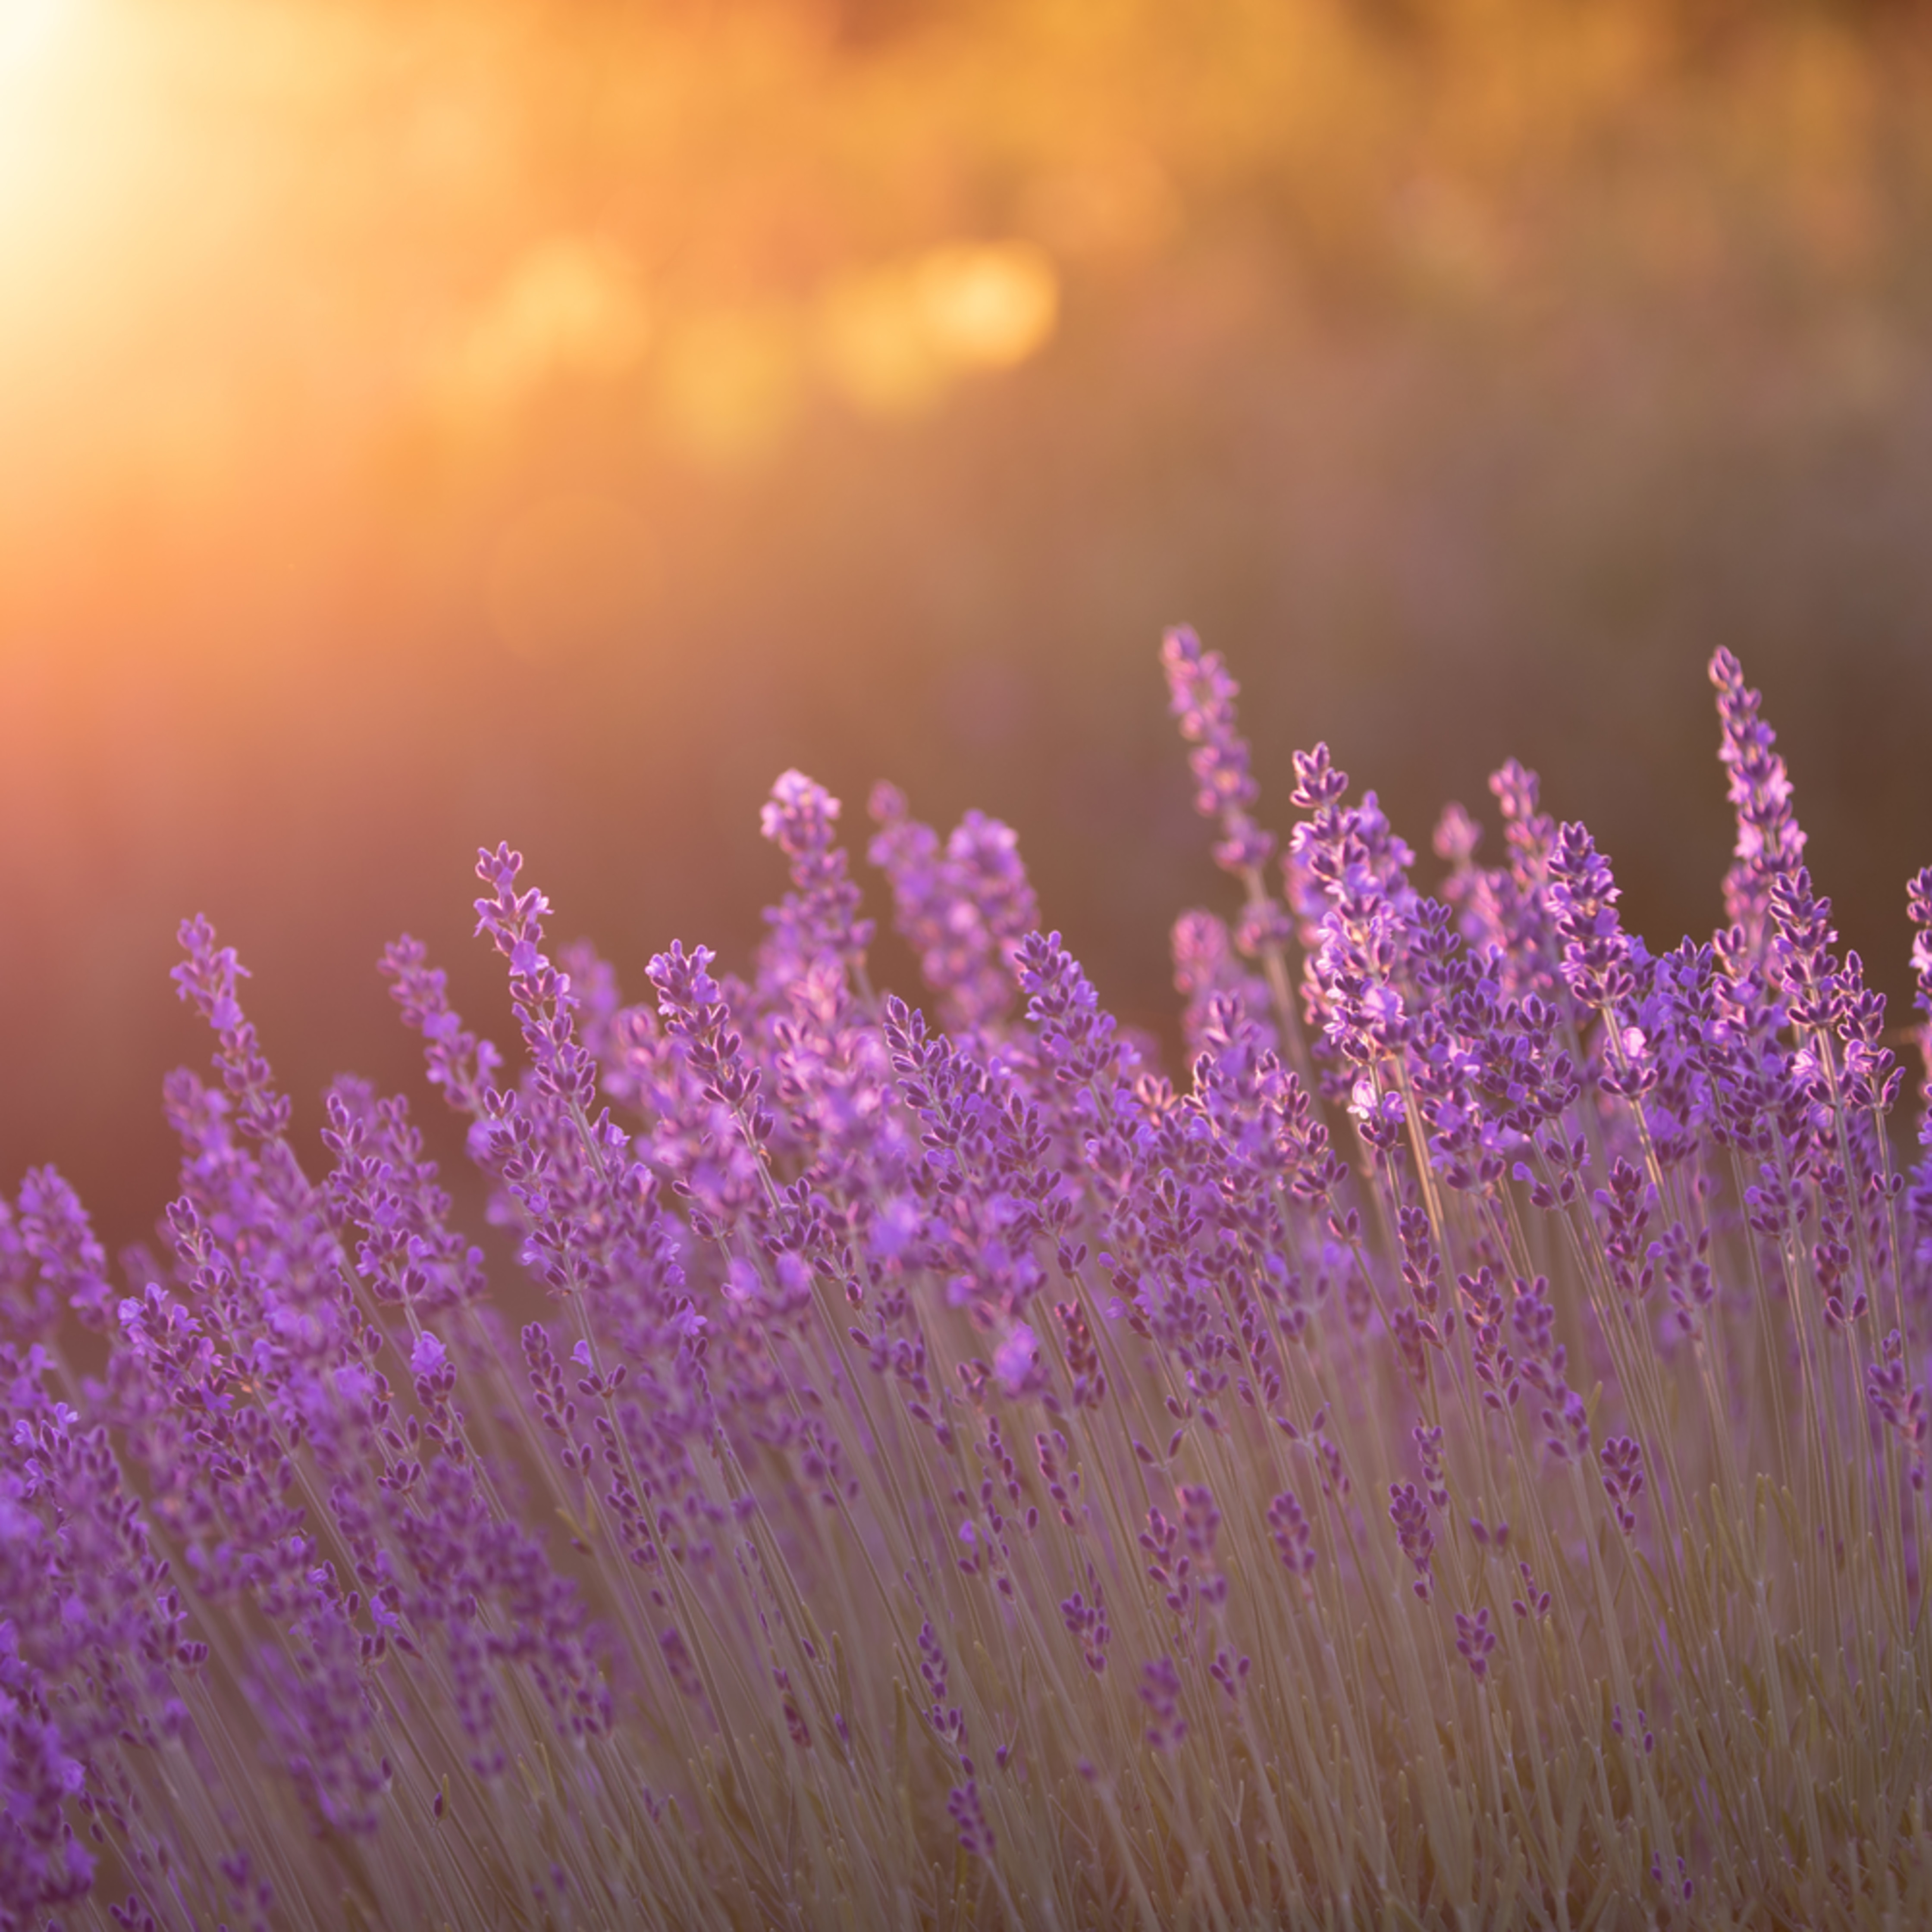 Sunset aroma vgmdyc